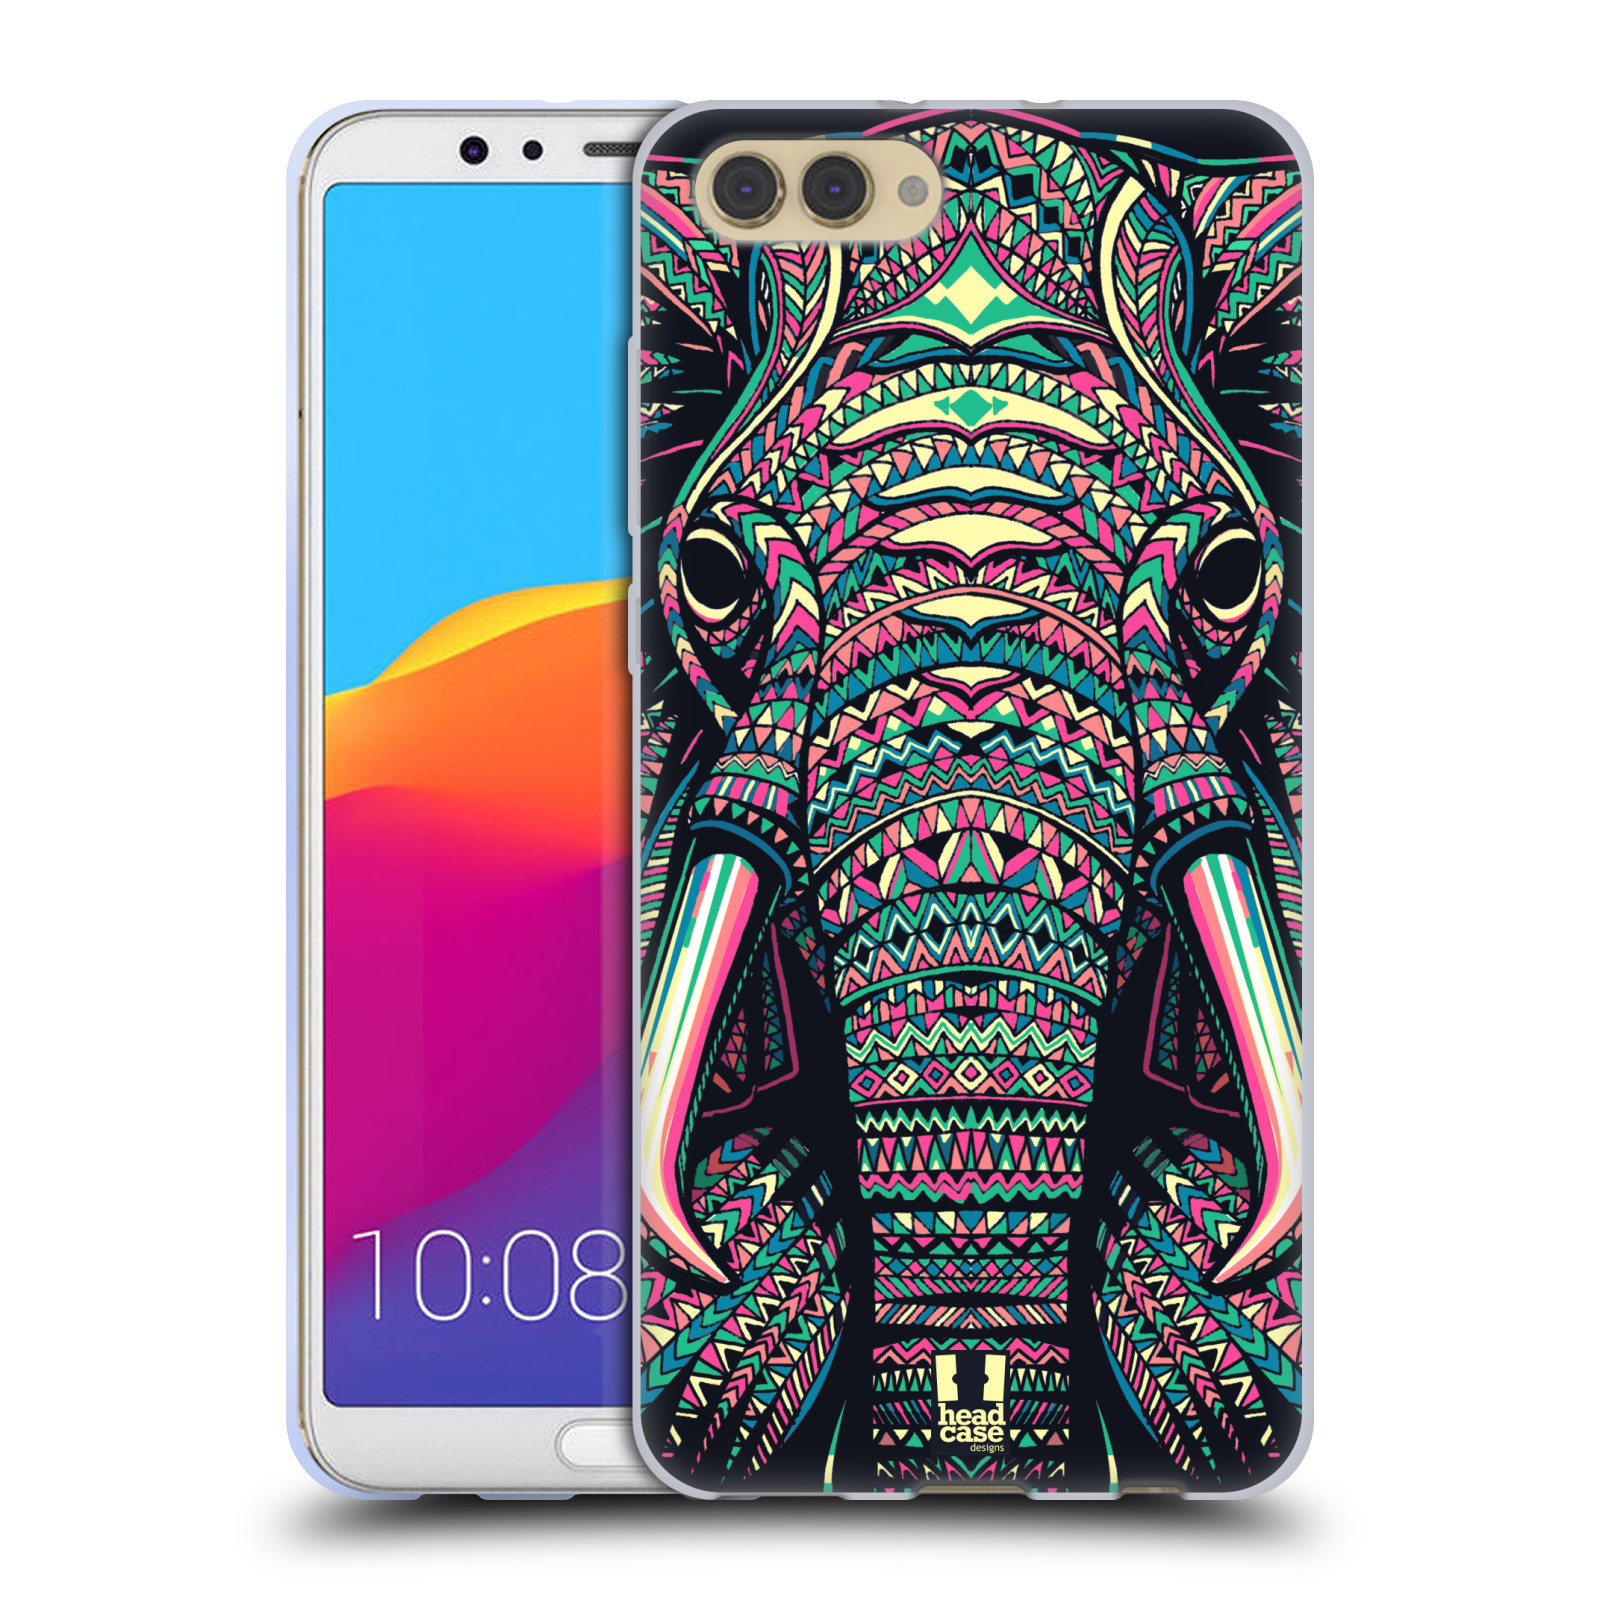 Silikonové pouzdro na mobil Honor View 10 - Head Case - AZTEC SLON